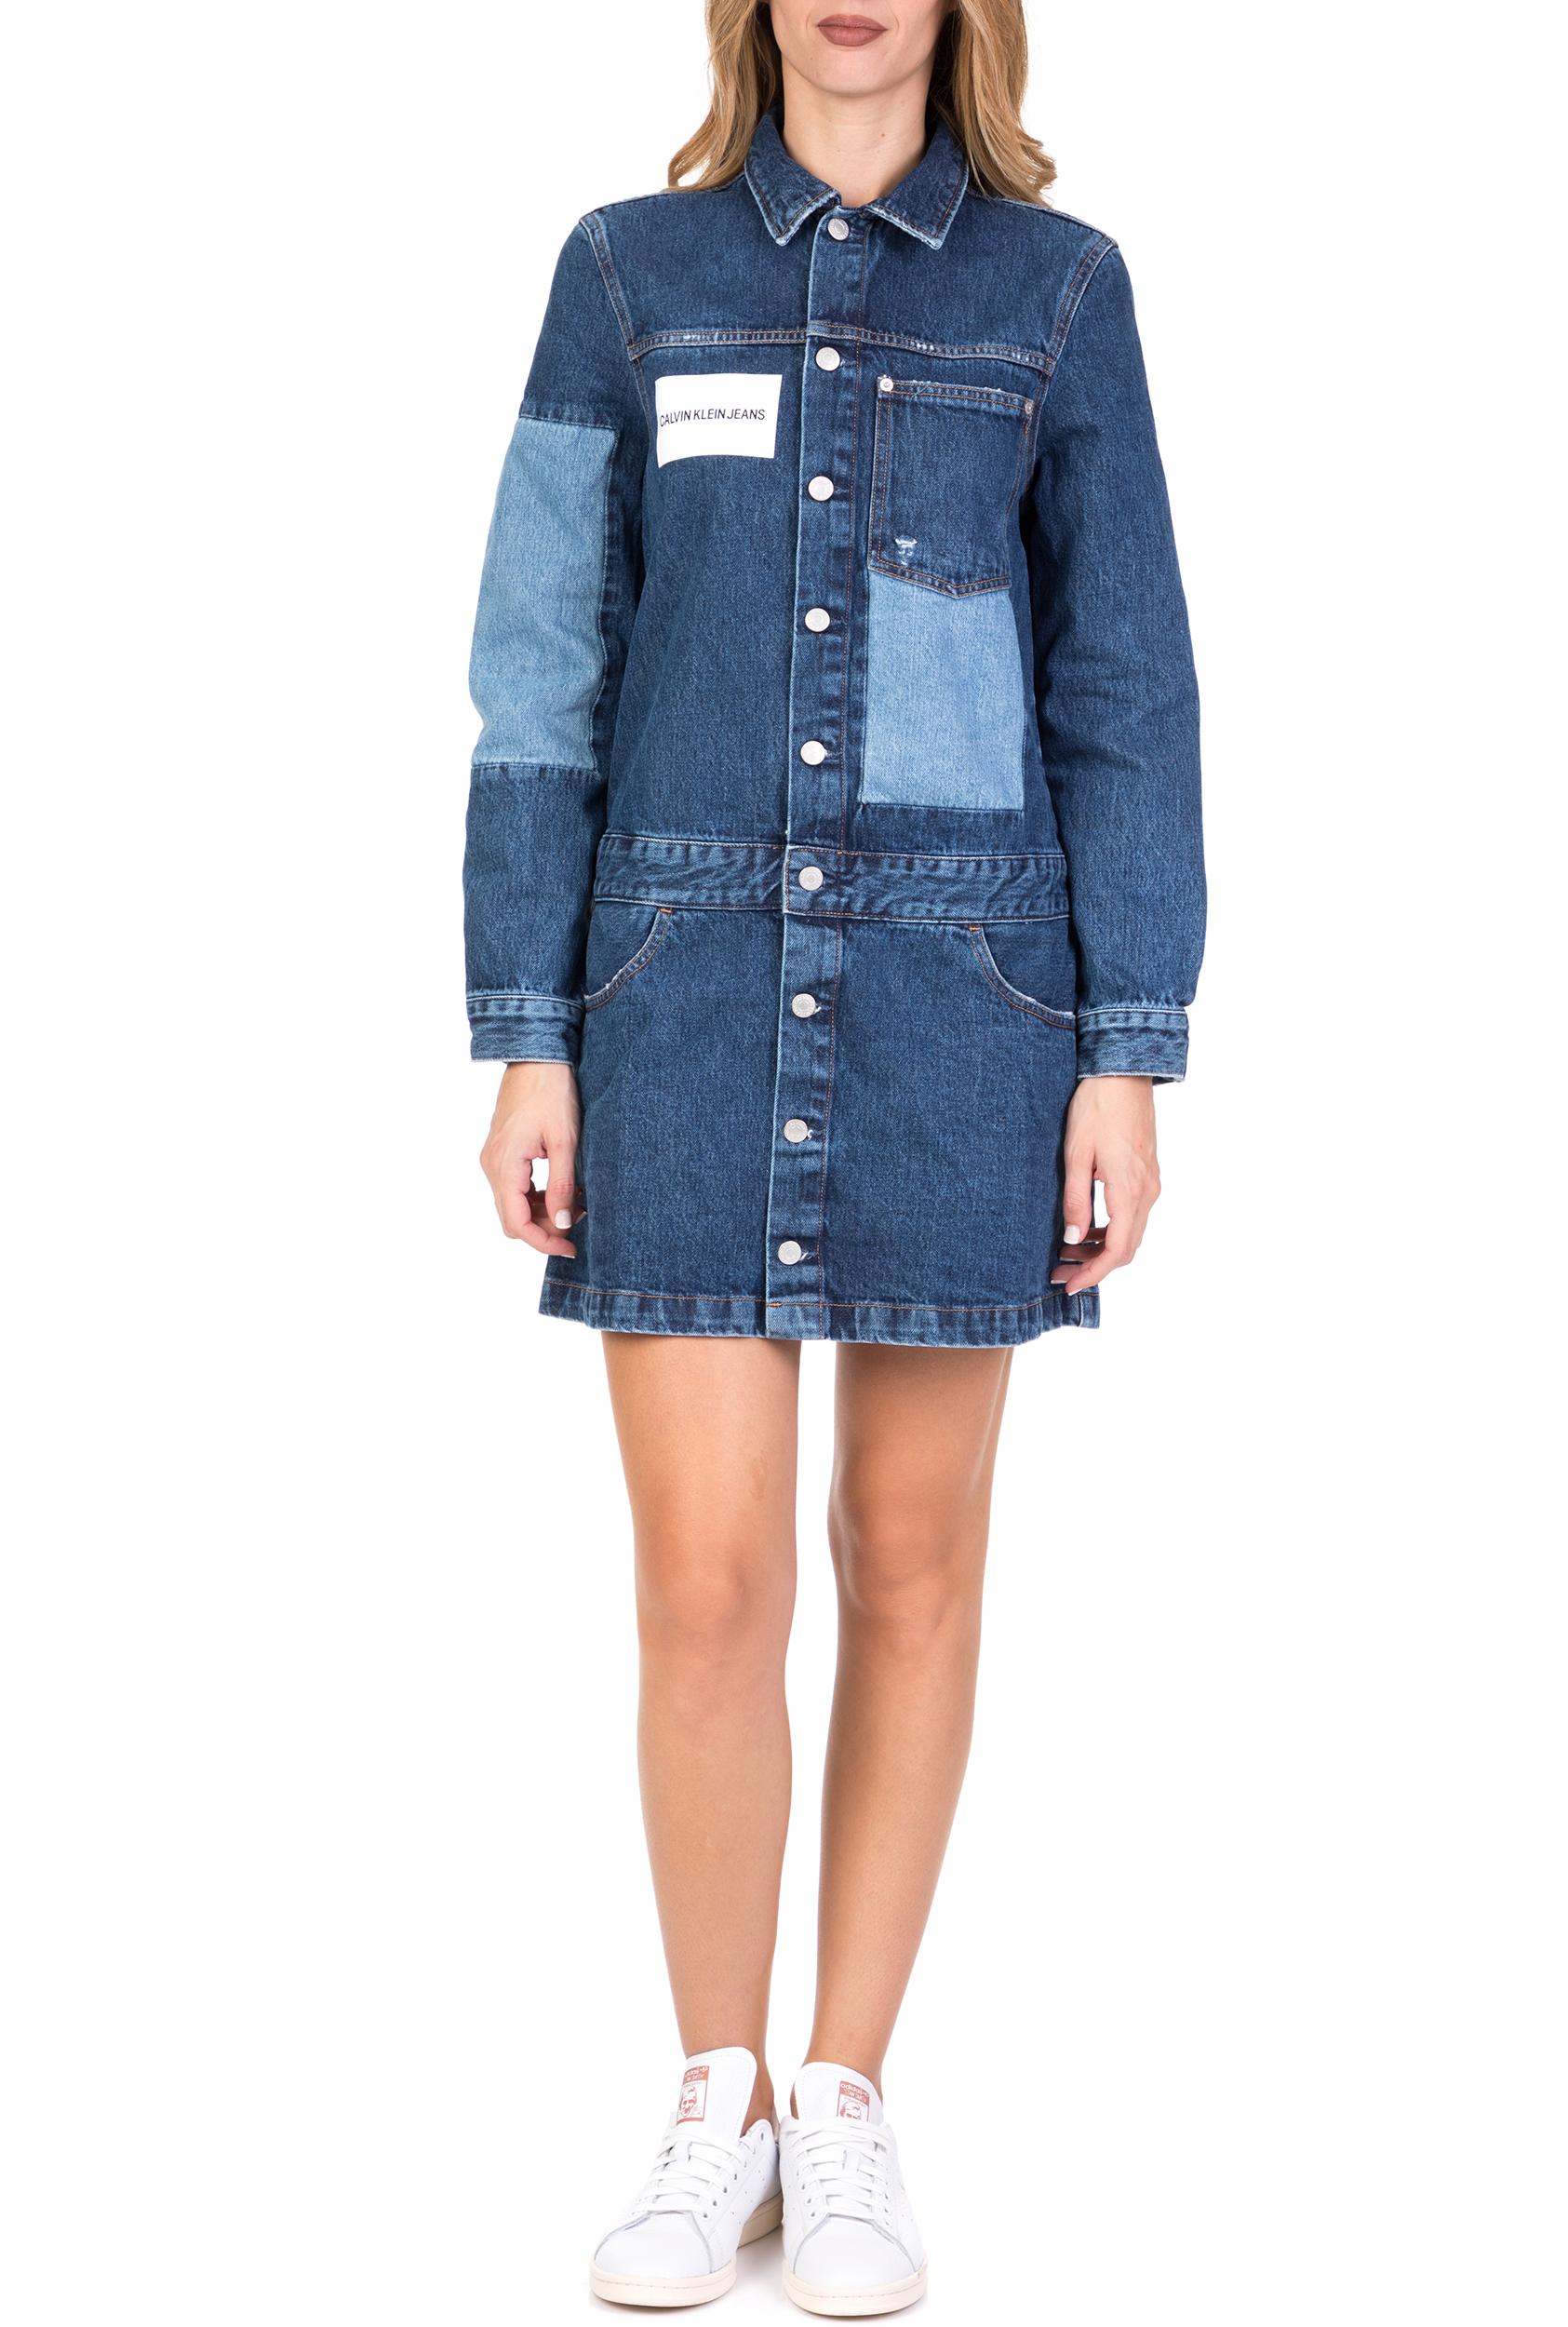 CALVIN KLEIN JEANS - Γυναικείο ντένιμ φόρεμα ONE POCKET TRUCKER μπλε γυναικεία ρούχα φόρεματα μίνι